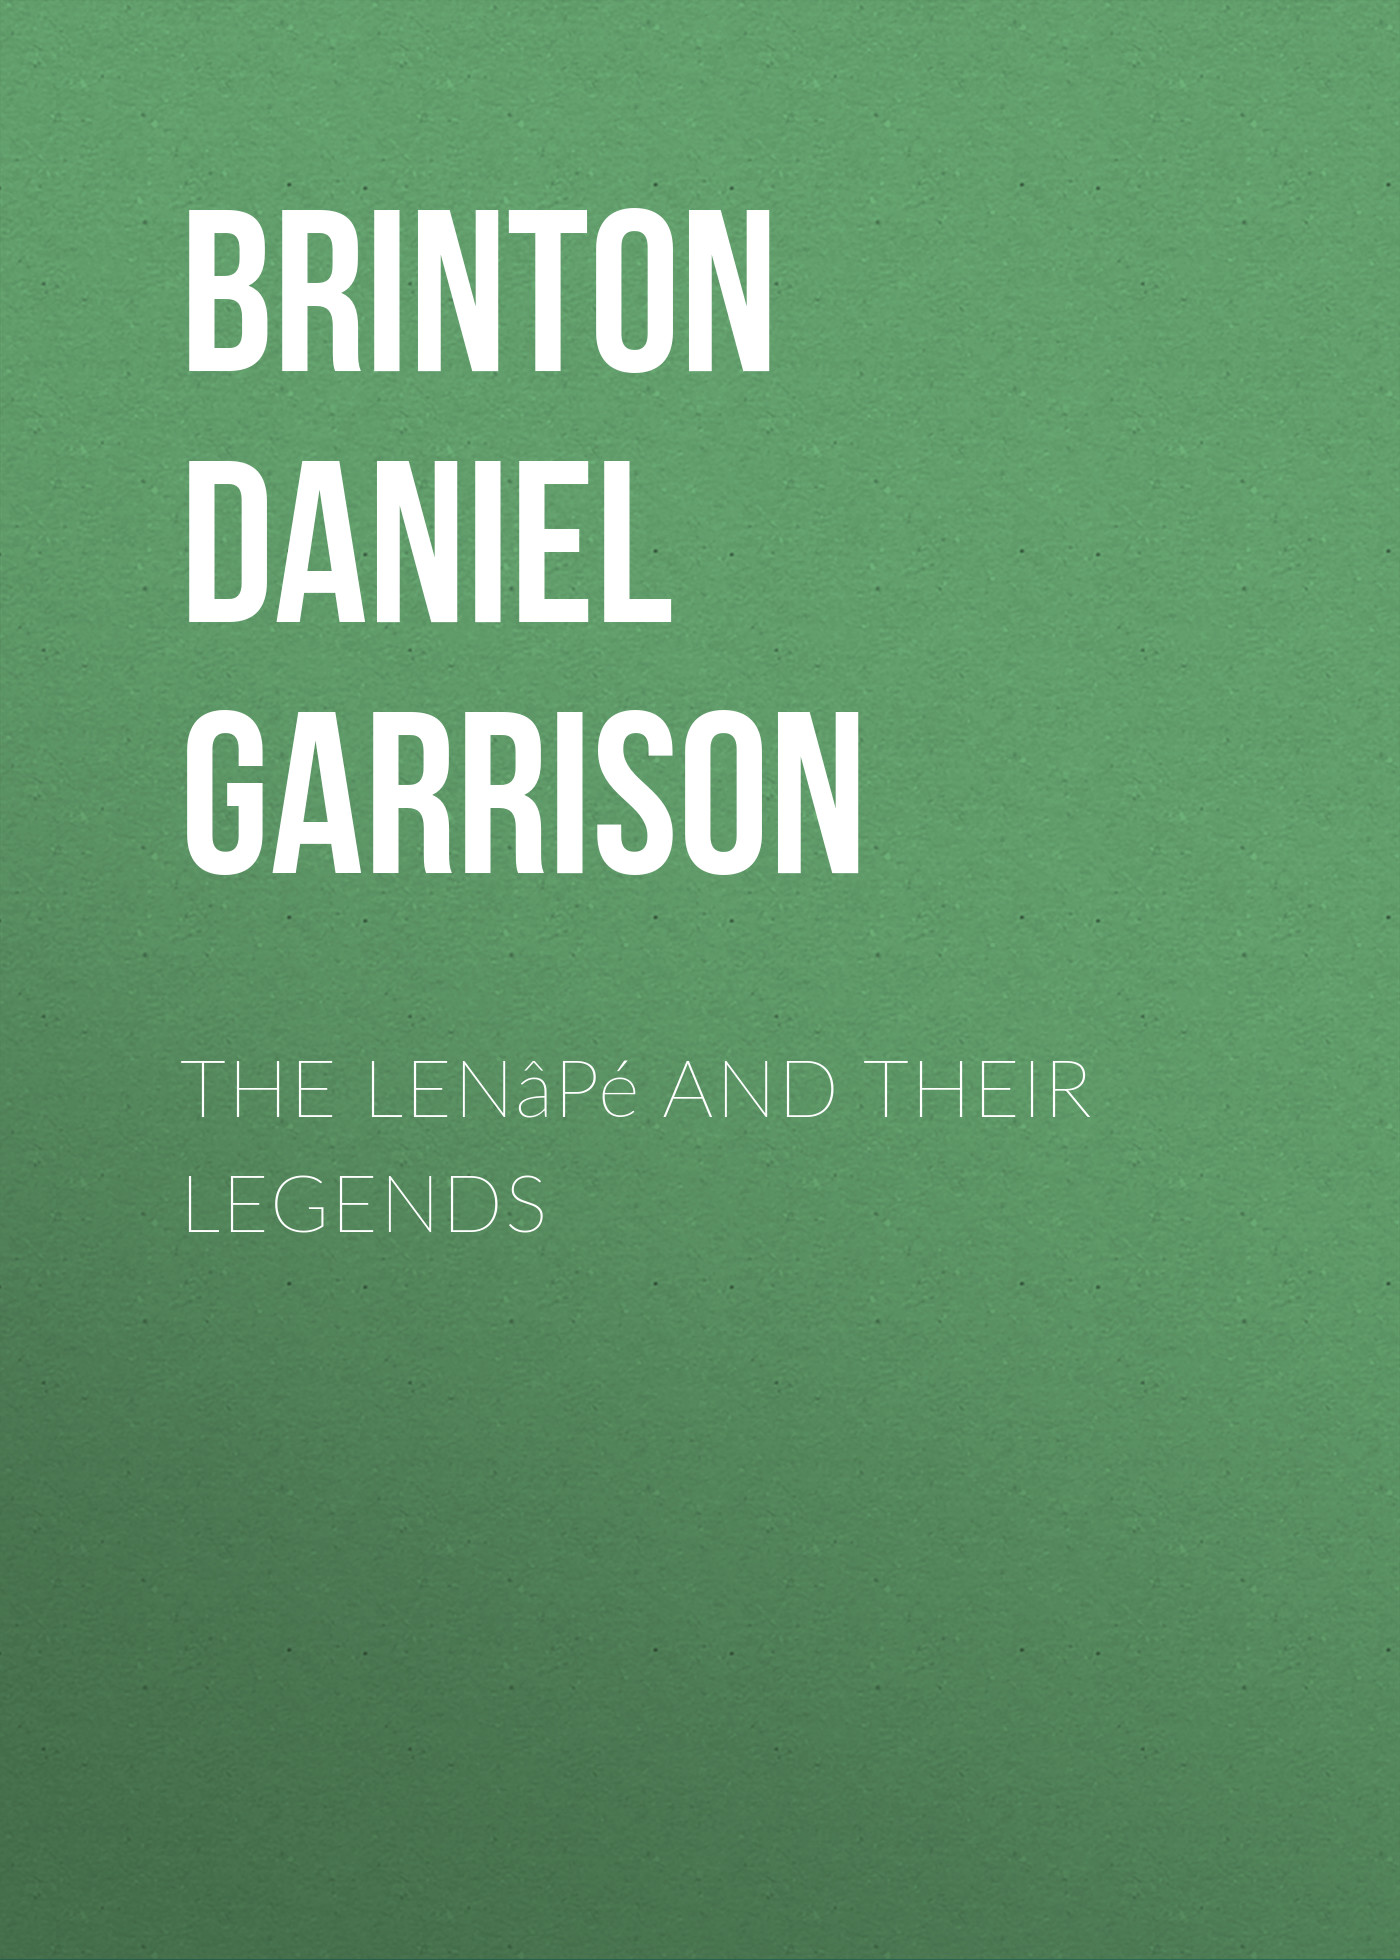 Brinton Daniel Garrison The Lenâpé and their Legends myths and legends